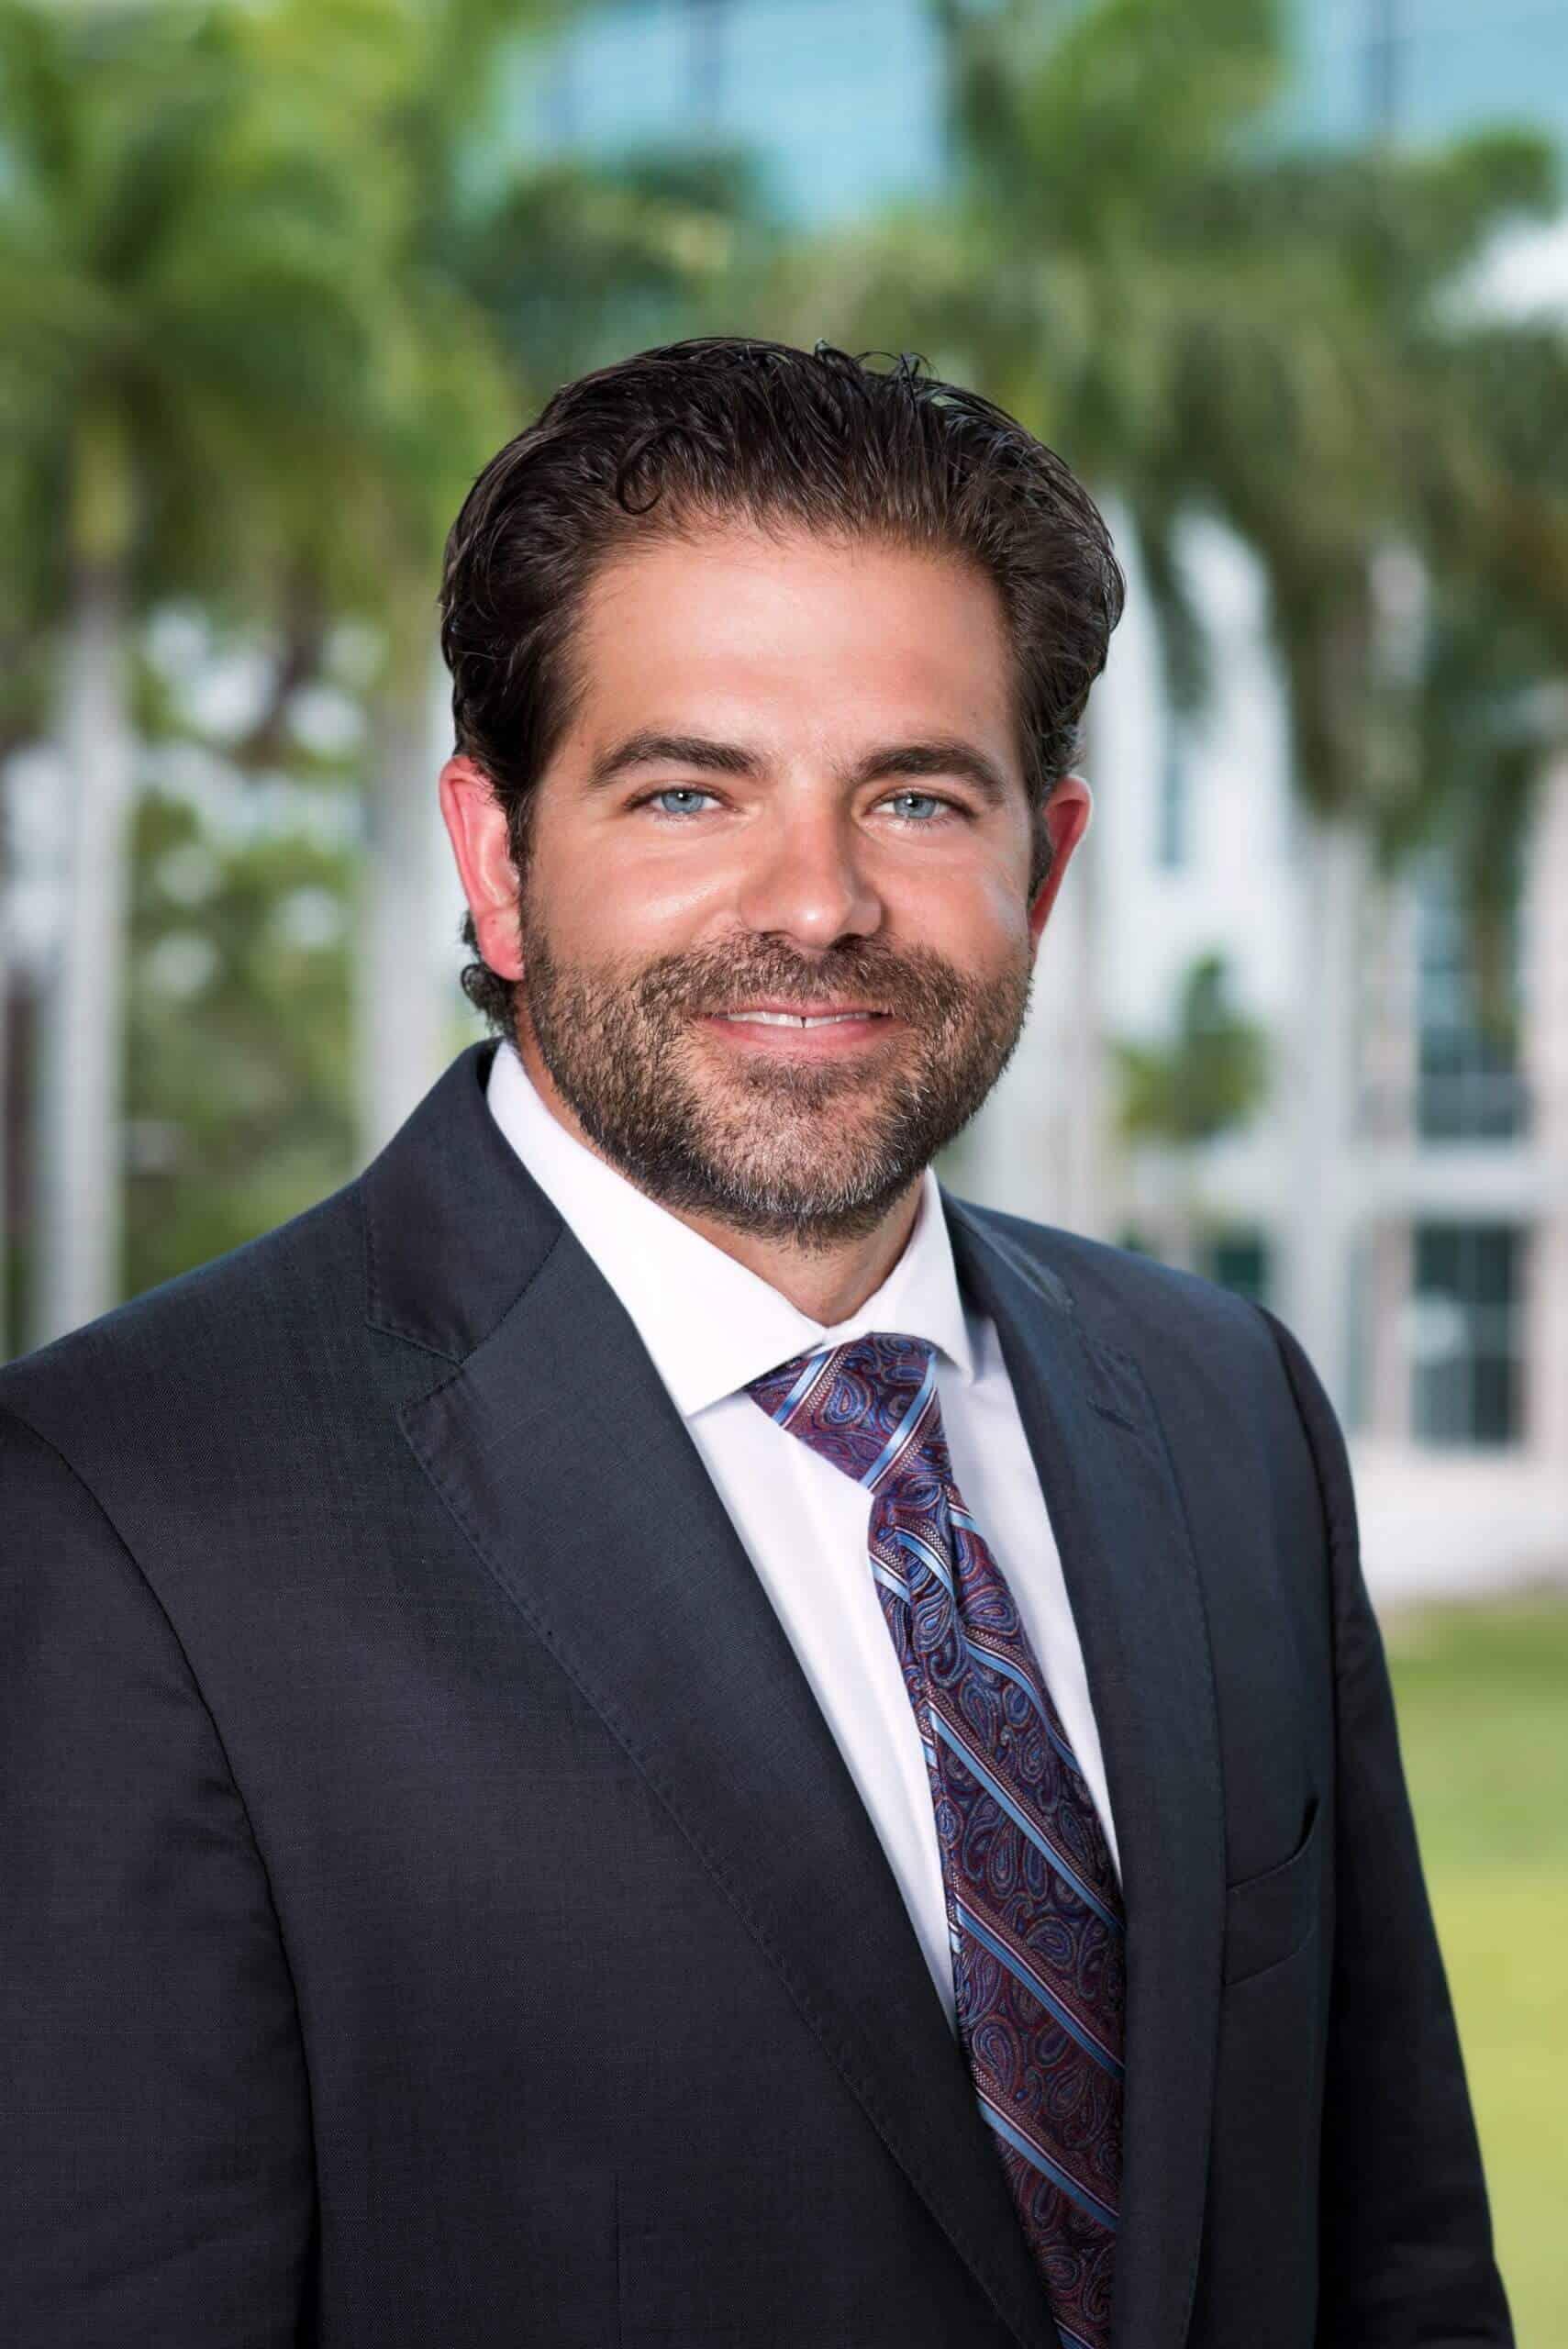 Michael Fayard, Attorney at Law